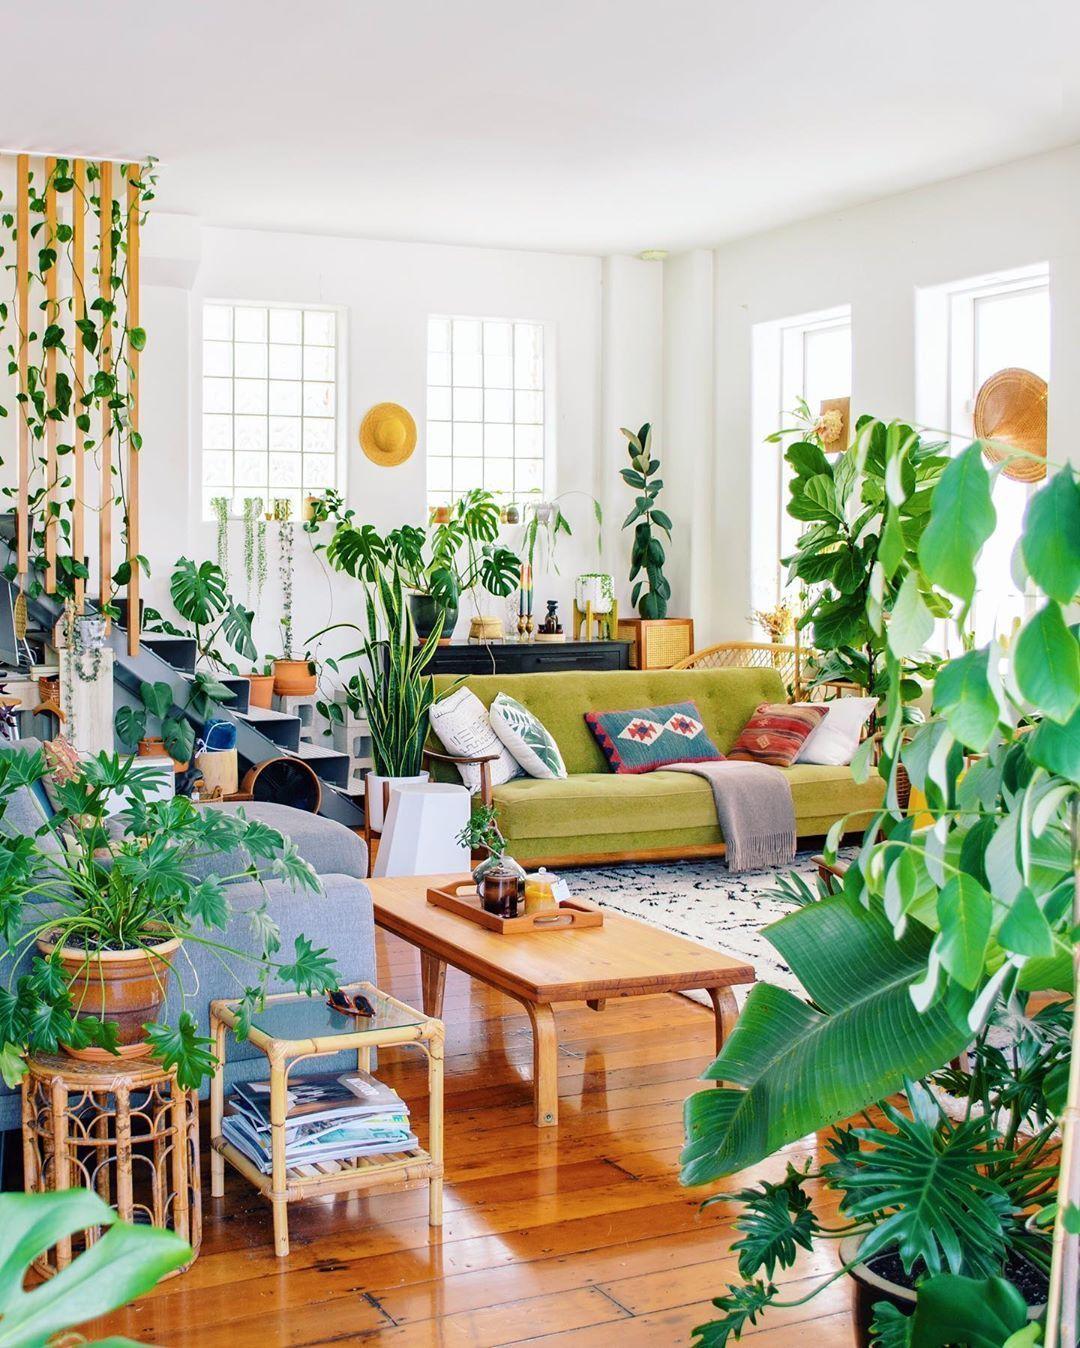 Home Interior Design Jungle Living Room In Nz Decor Living